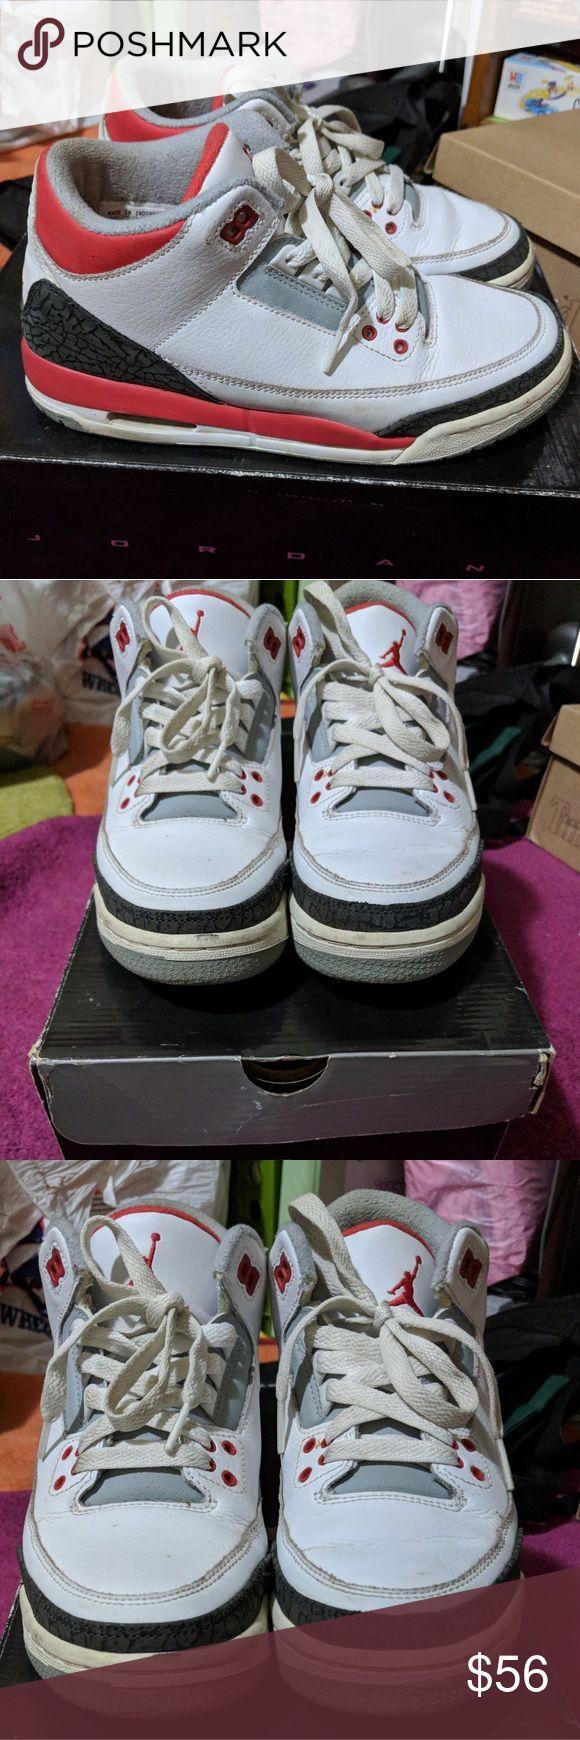 Air Jordan Retro 3s Authentic Air Jordan retro 3s (kids). Size 5.5Y = women's 7. Used. Color: fire red, black, and white. Air Jordan Shoes Sneakers